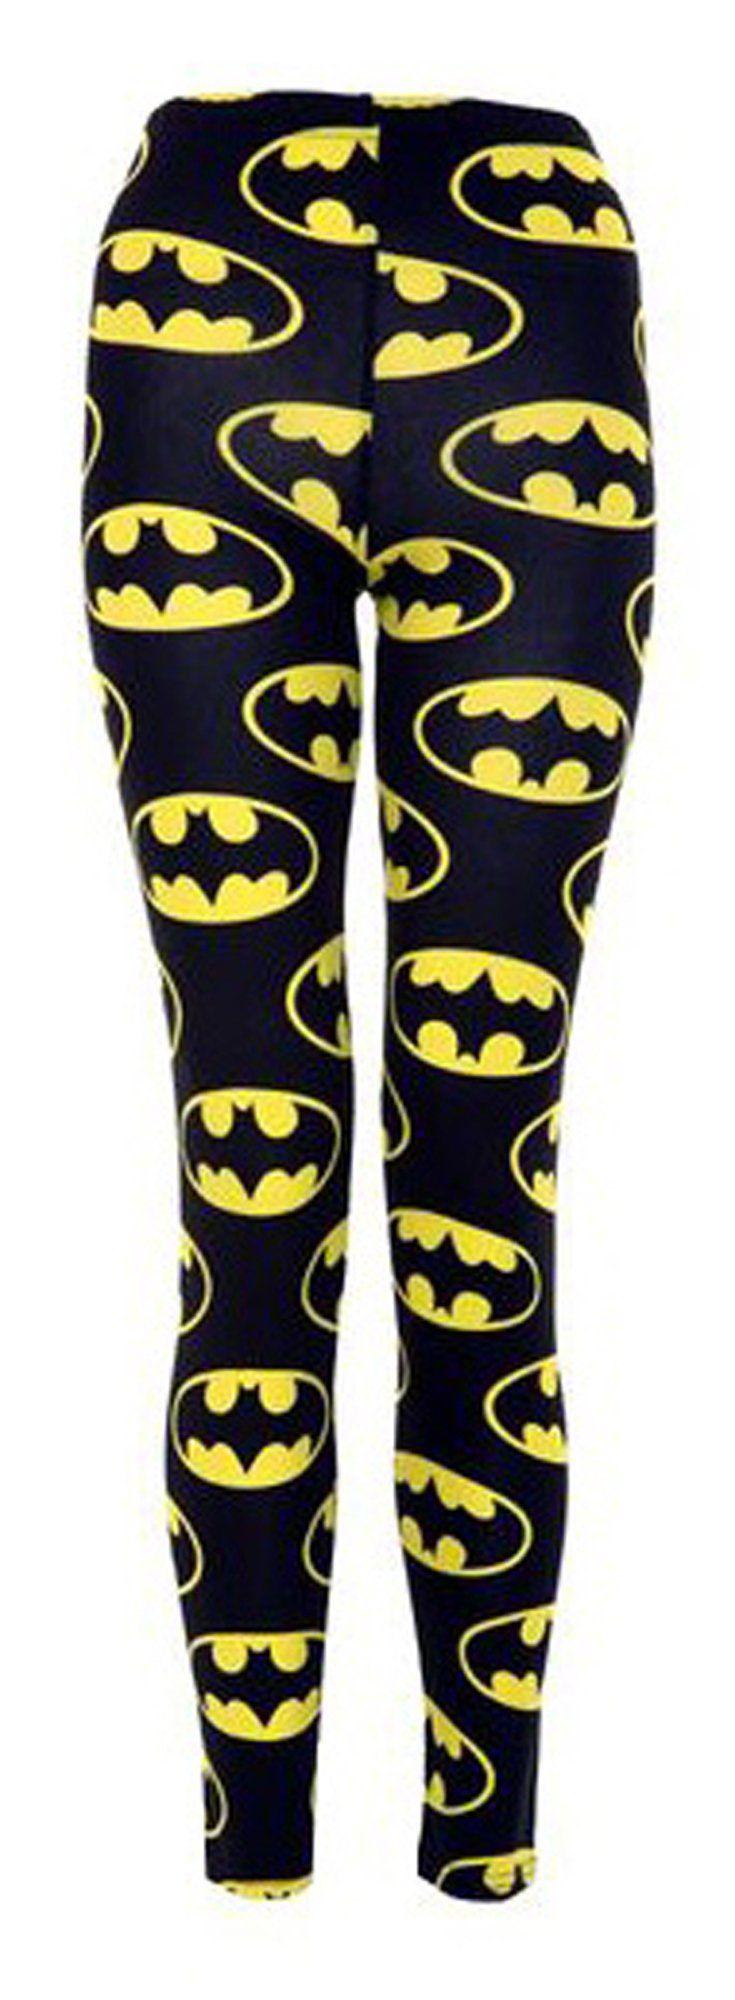 Crazy Girls Ladies Womens Batman Zebra Aztec Printed Leggings